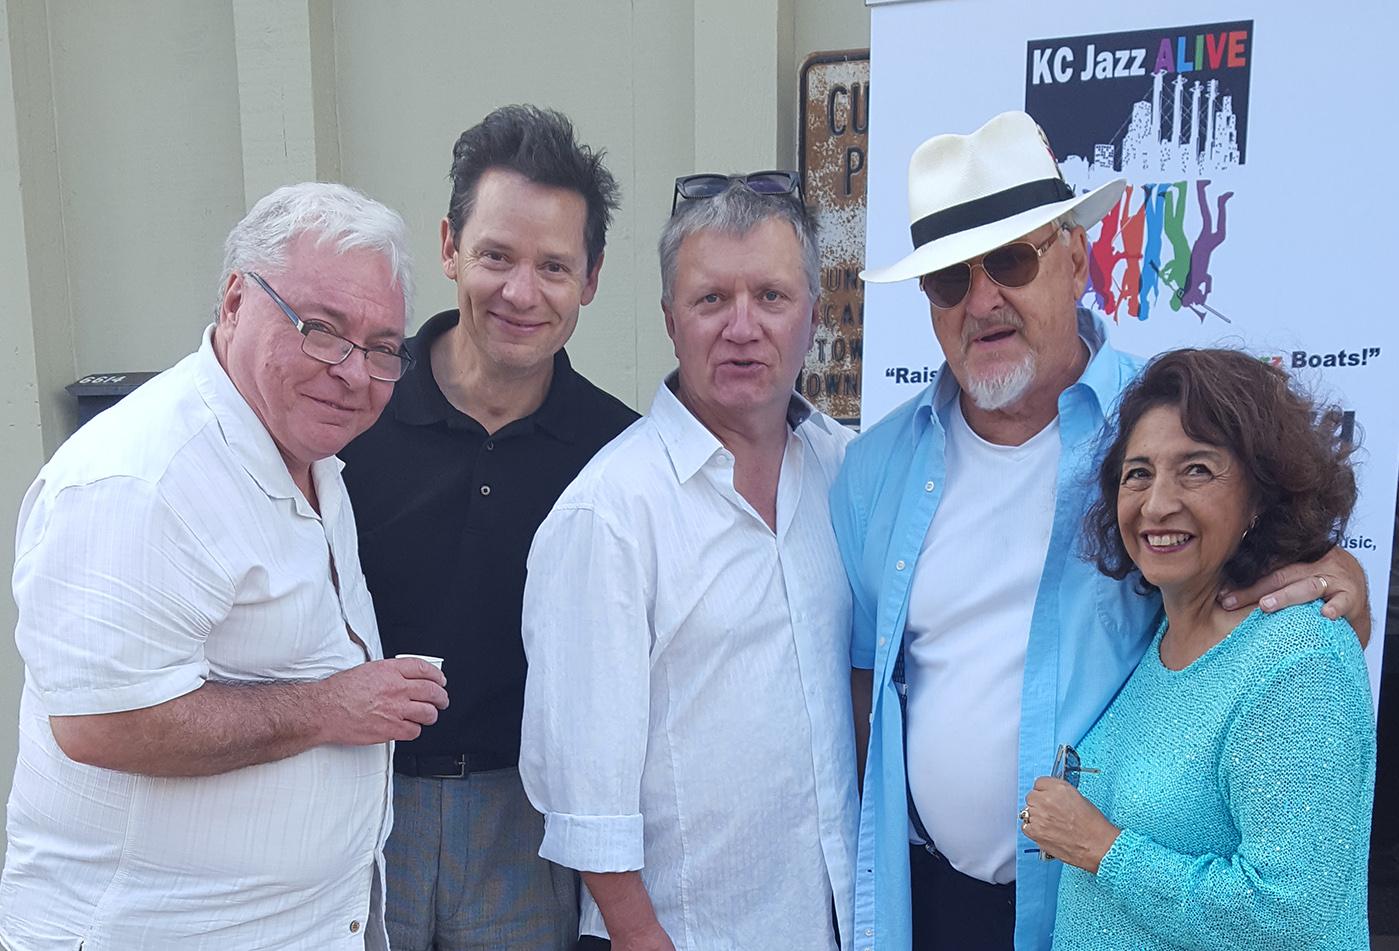 Tom Wells And Geri St. Clair With Guitarist Rod Fleeman, Pianist Michael Pagan, Saxophonist Todd Wilkserson